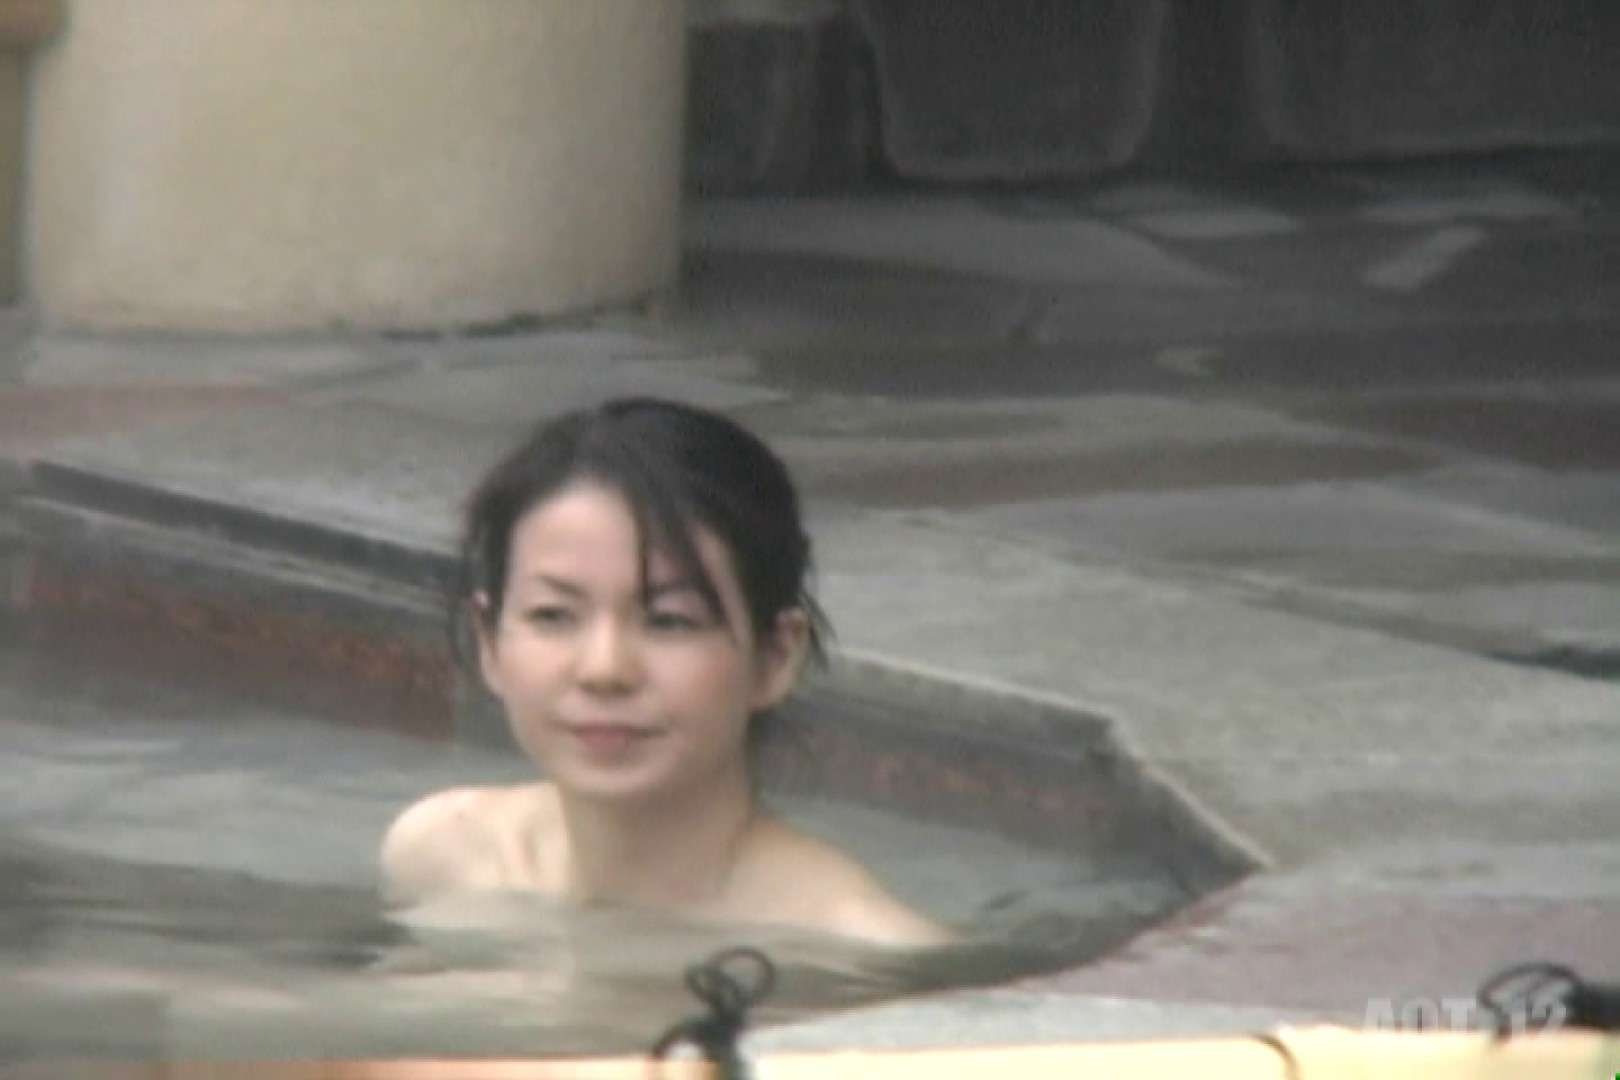 Aquaな露天風呂Vol.811 0   0  38連発 1